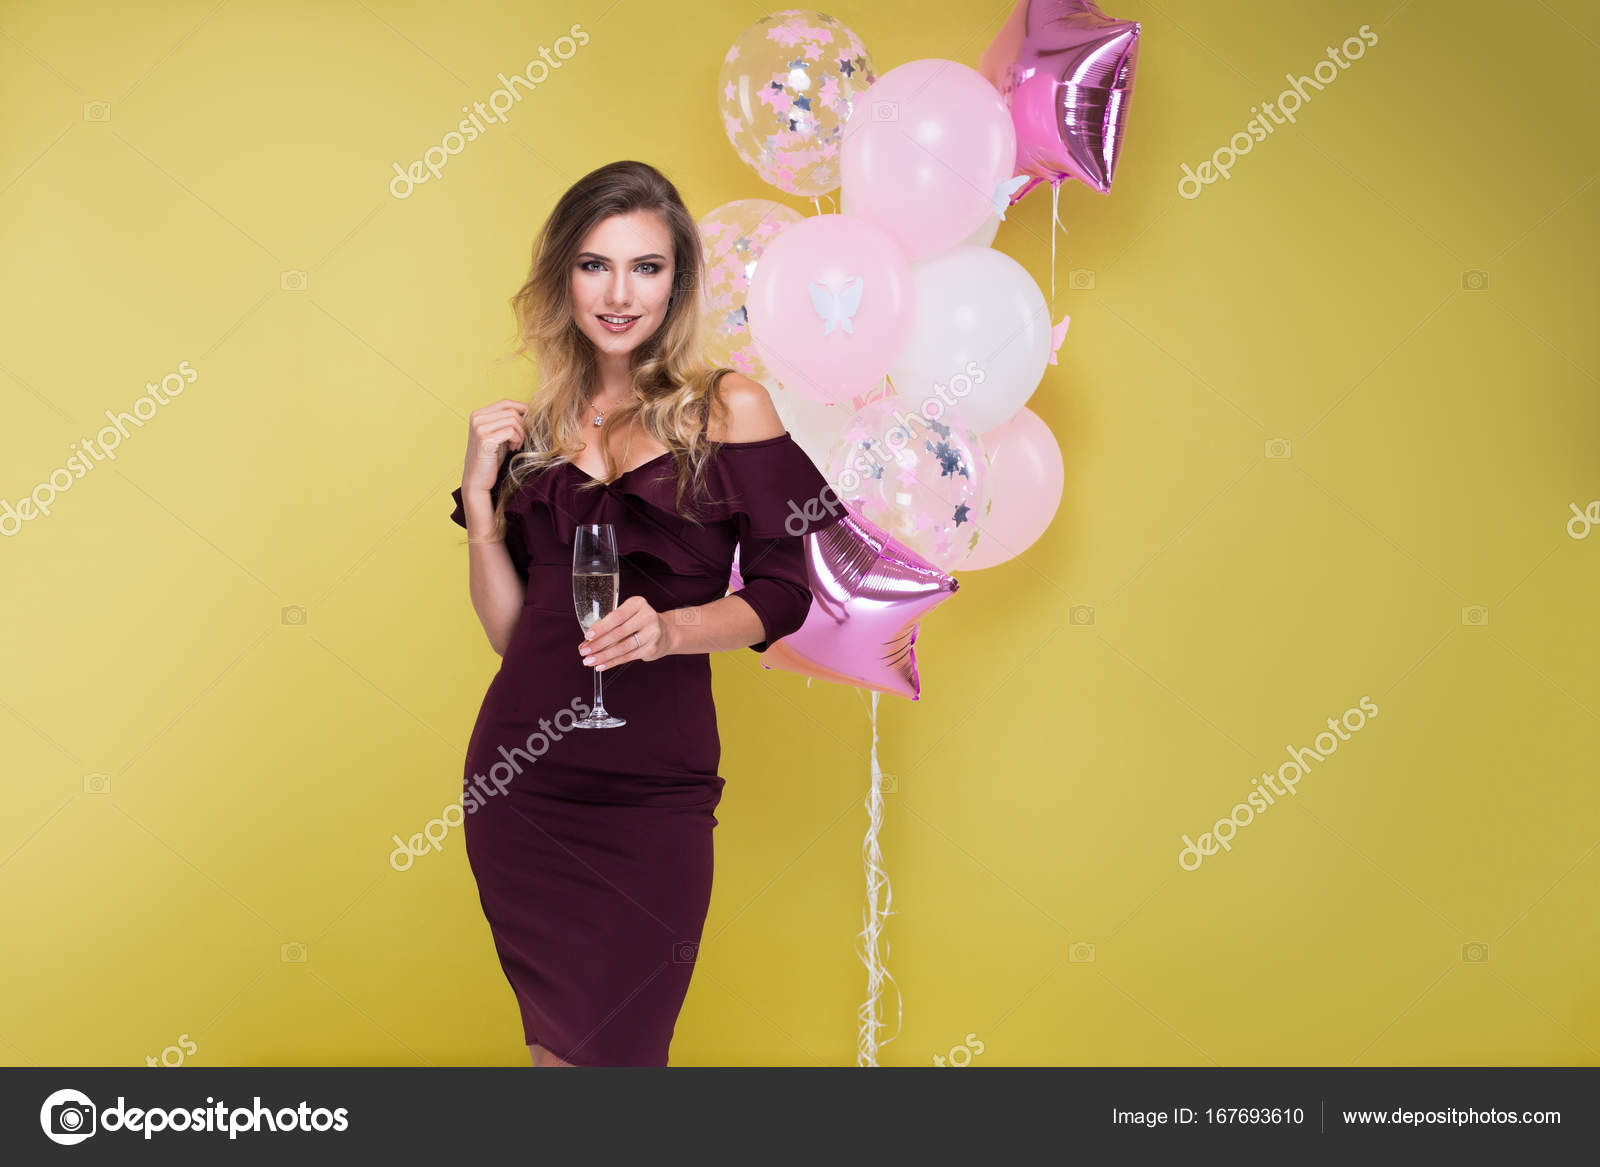 dd624a971e36 Retrato de hermosa mujer rubia en estudio sobre fondo amarillo con ...